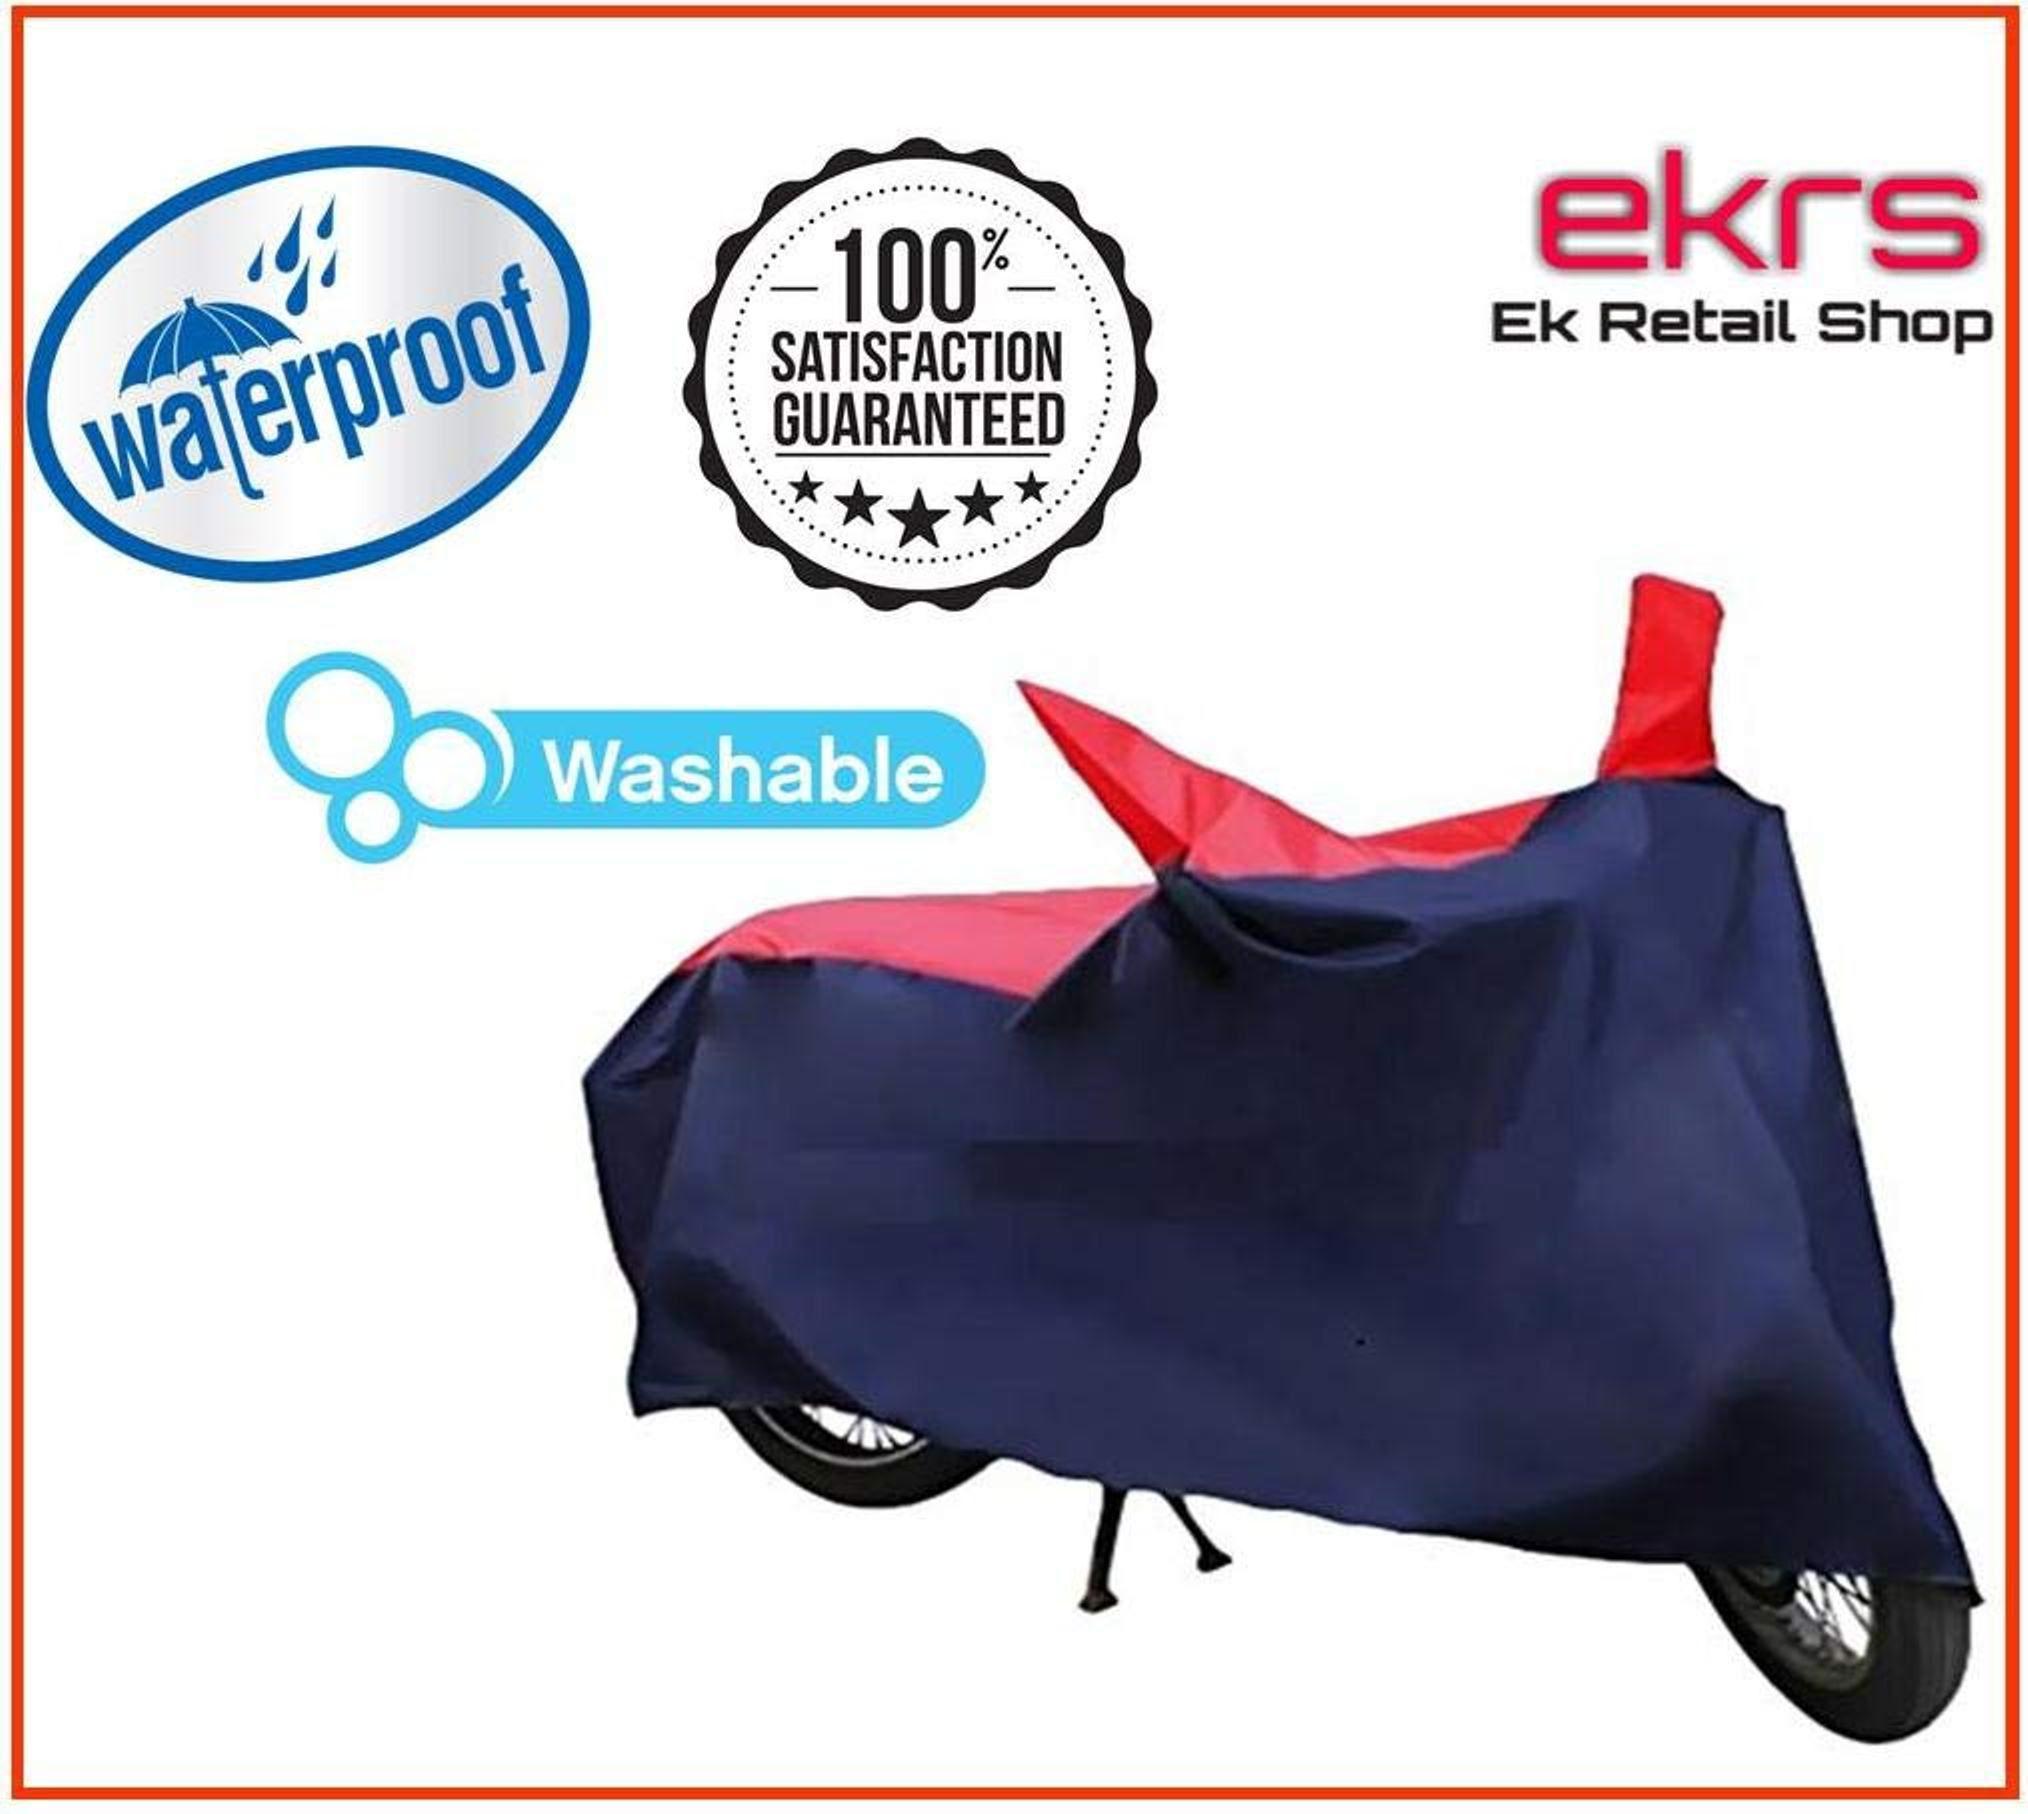 EKRS Nevy/Red Matty Waterproof Bike Body Cover for Hero Duet VX